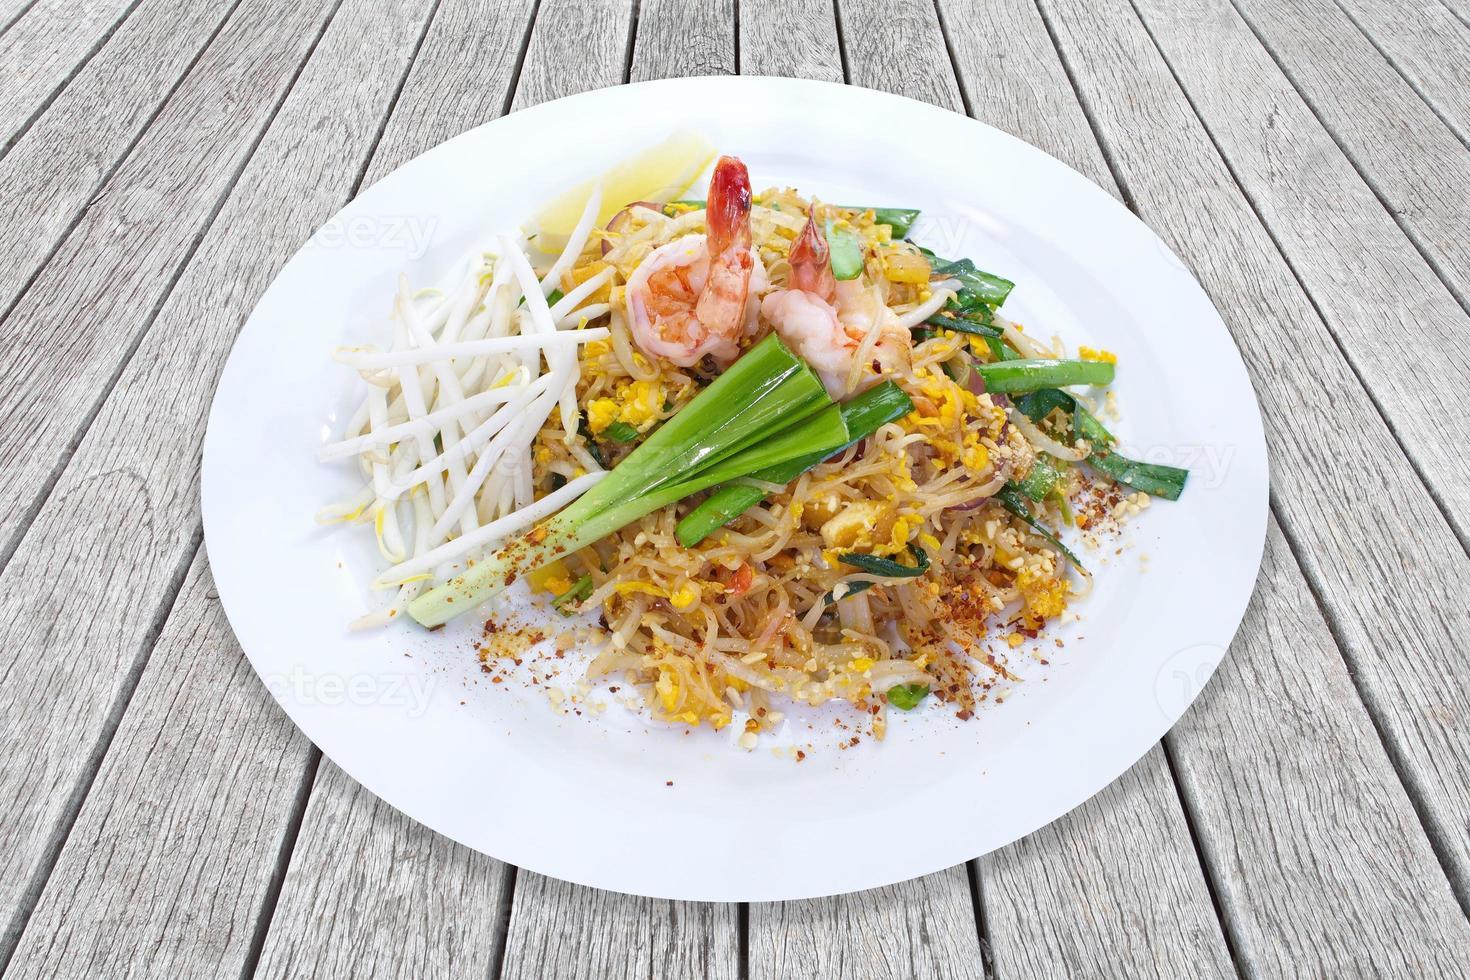 pad thai, fideos de arroz salteados thai, huevos, tofu y vegetales foto